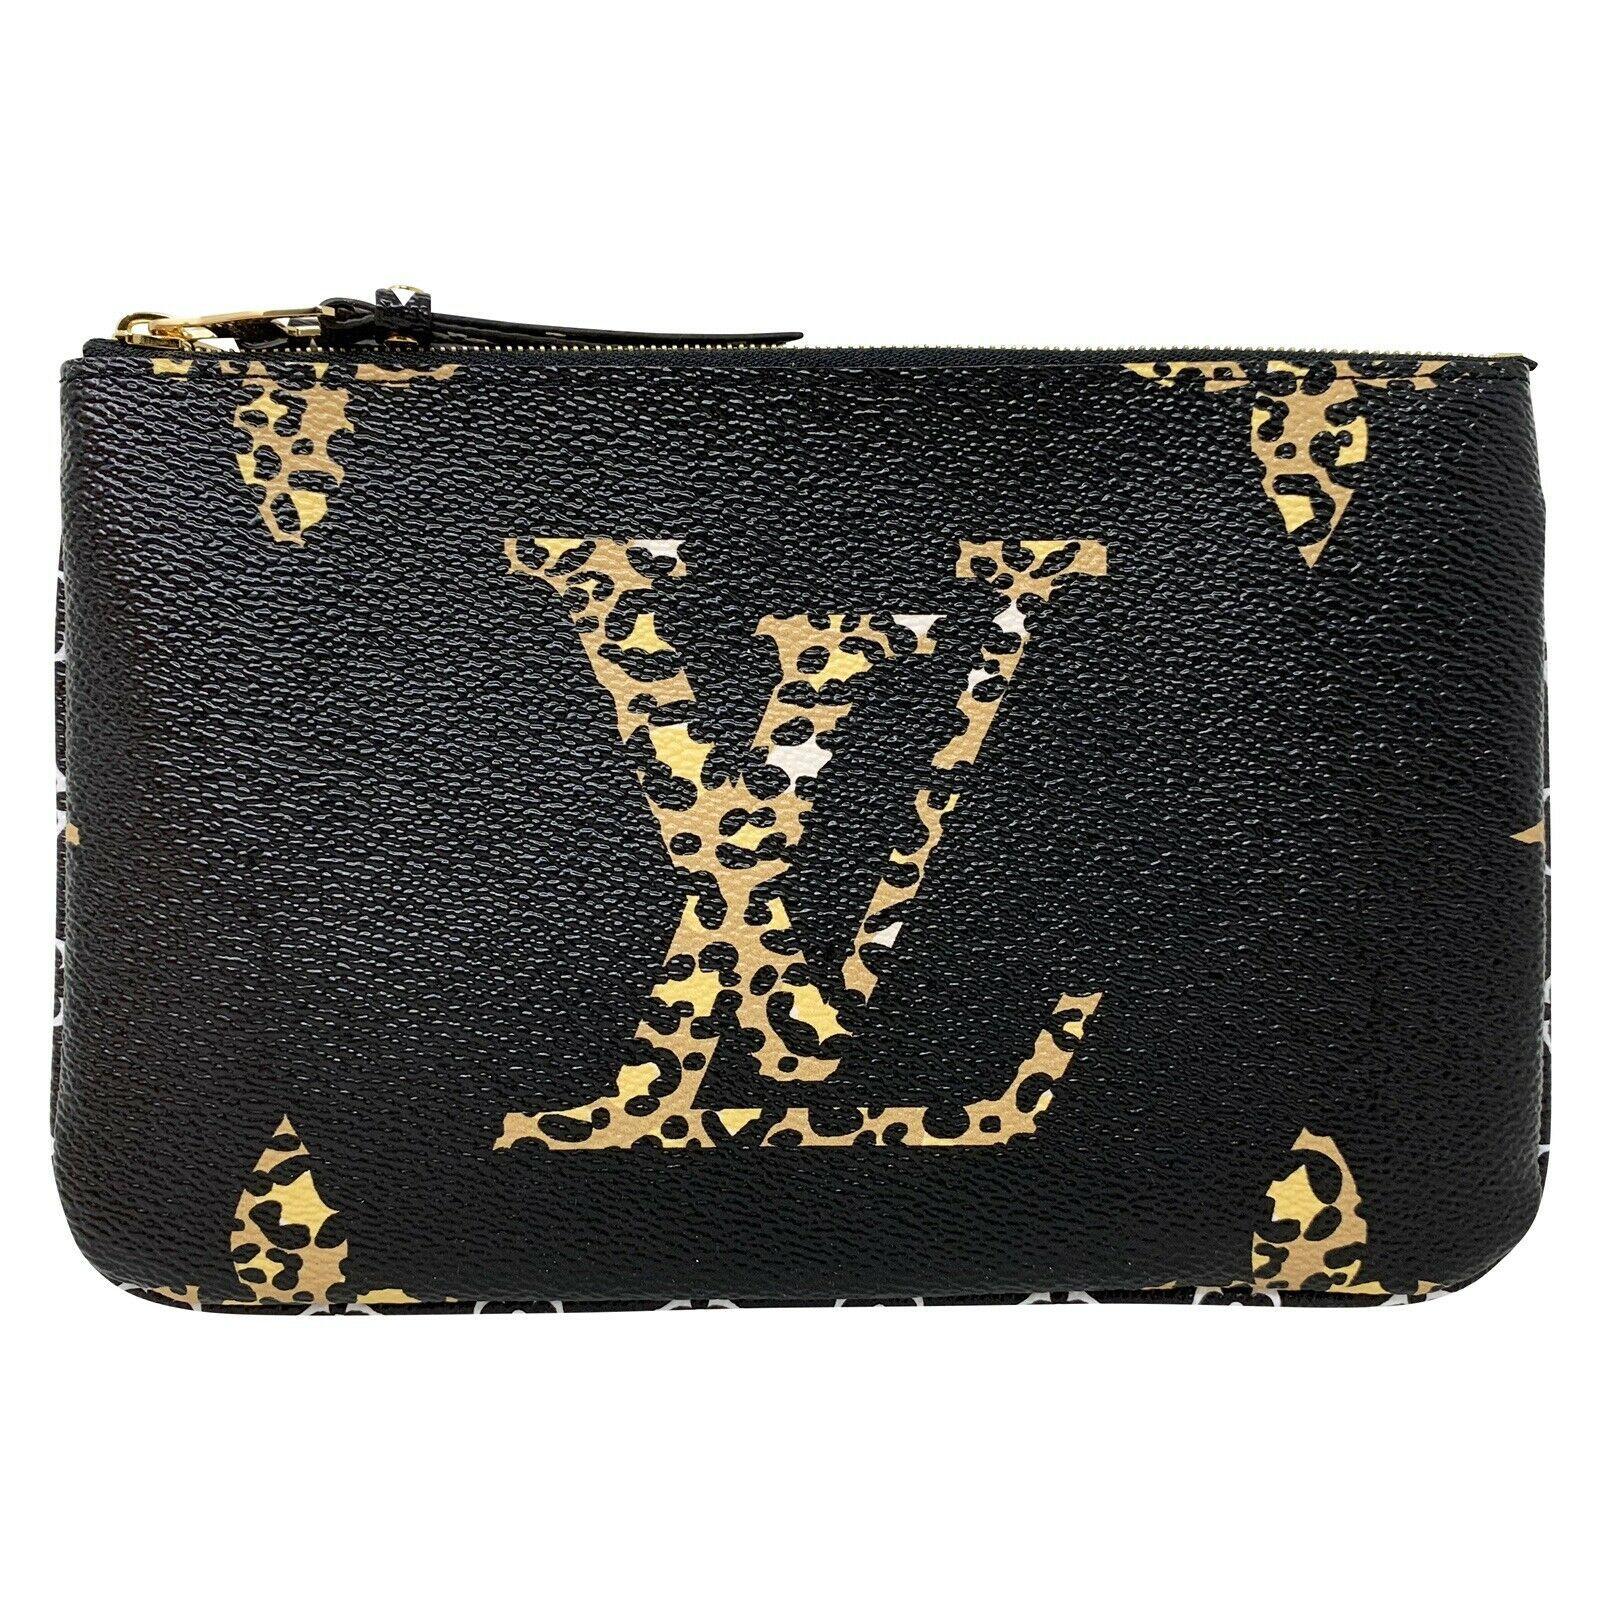 NEW Louis Vuitton Pochette Double Zip Black Jungle Giant Monogram Crossbody Bag image 2